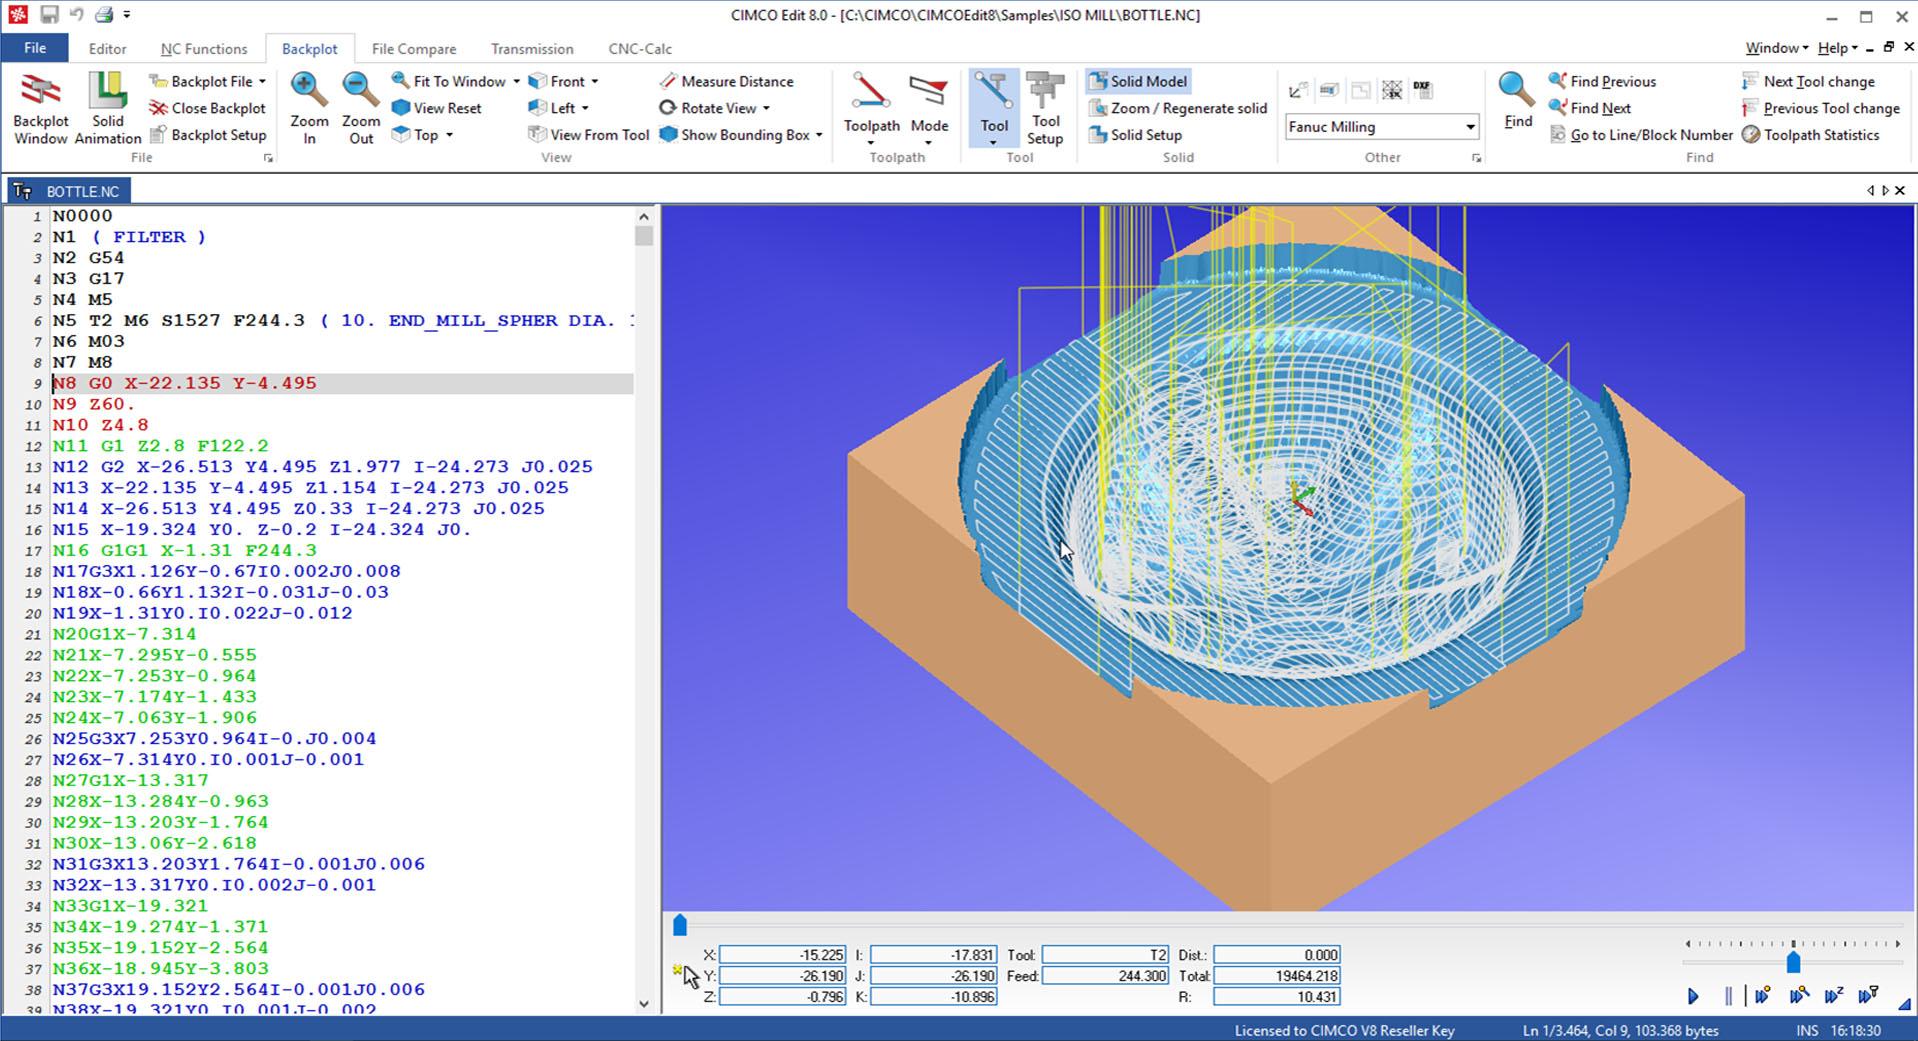 Zrzut ekranu CIMCO Edit